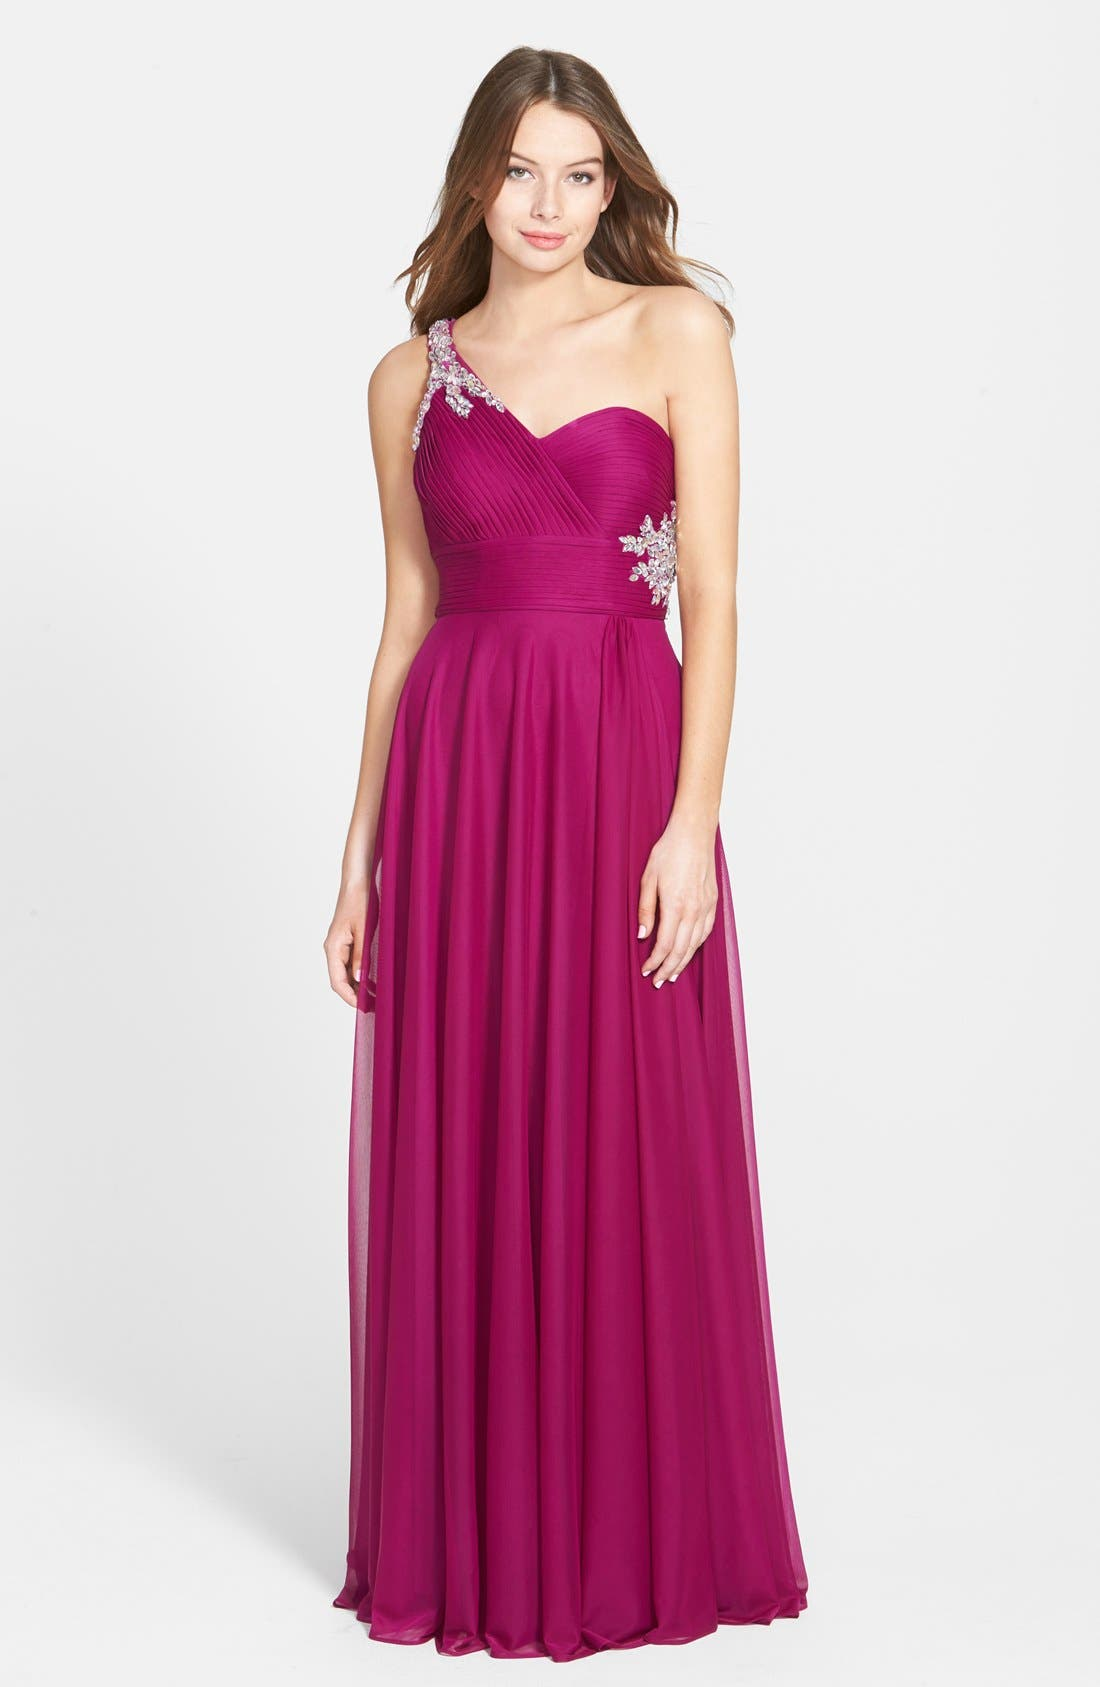 Main Image - Xscape Embellished One Shoulder Mesh Gown